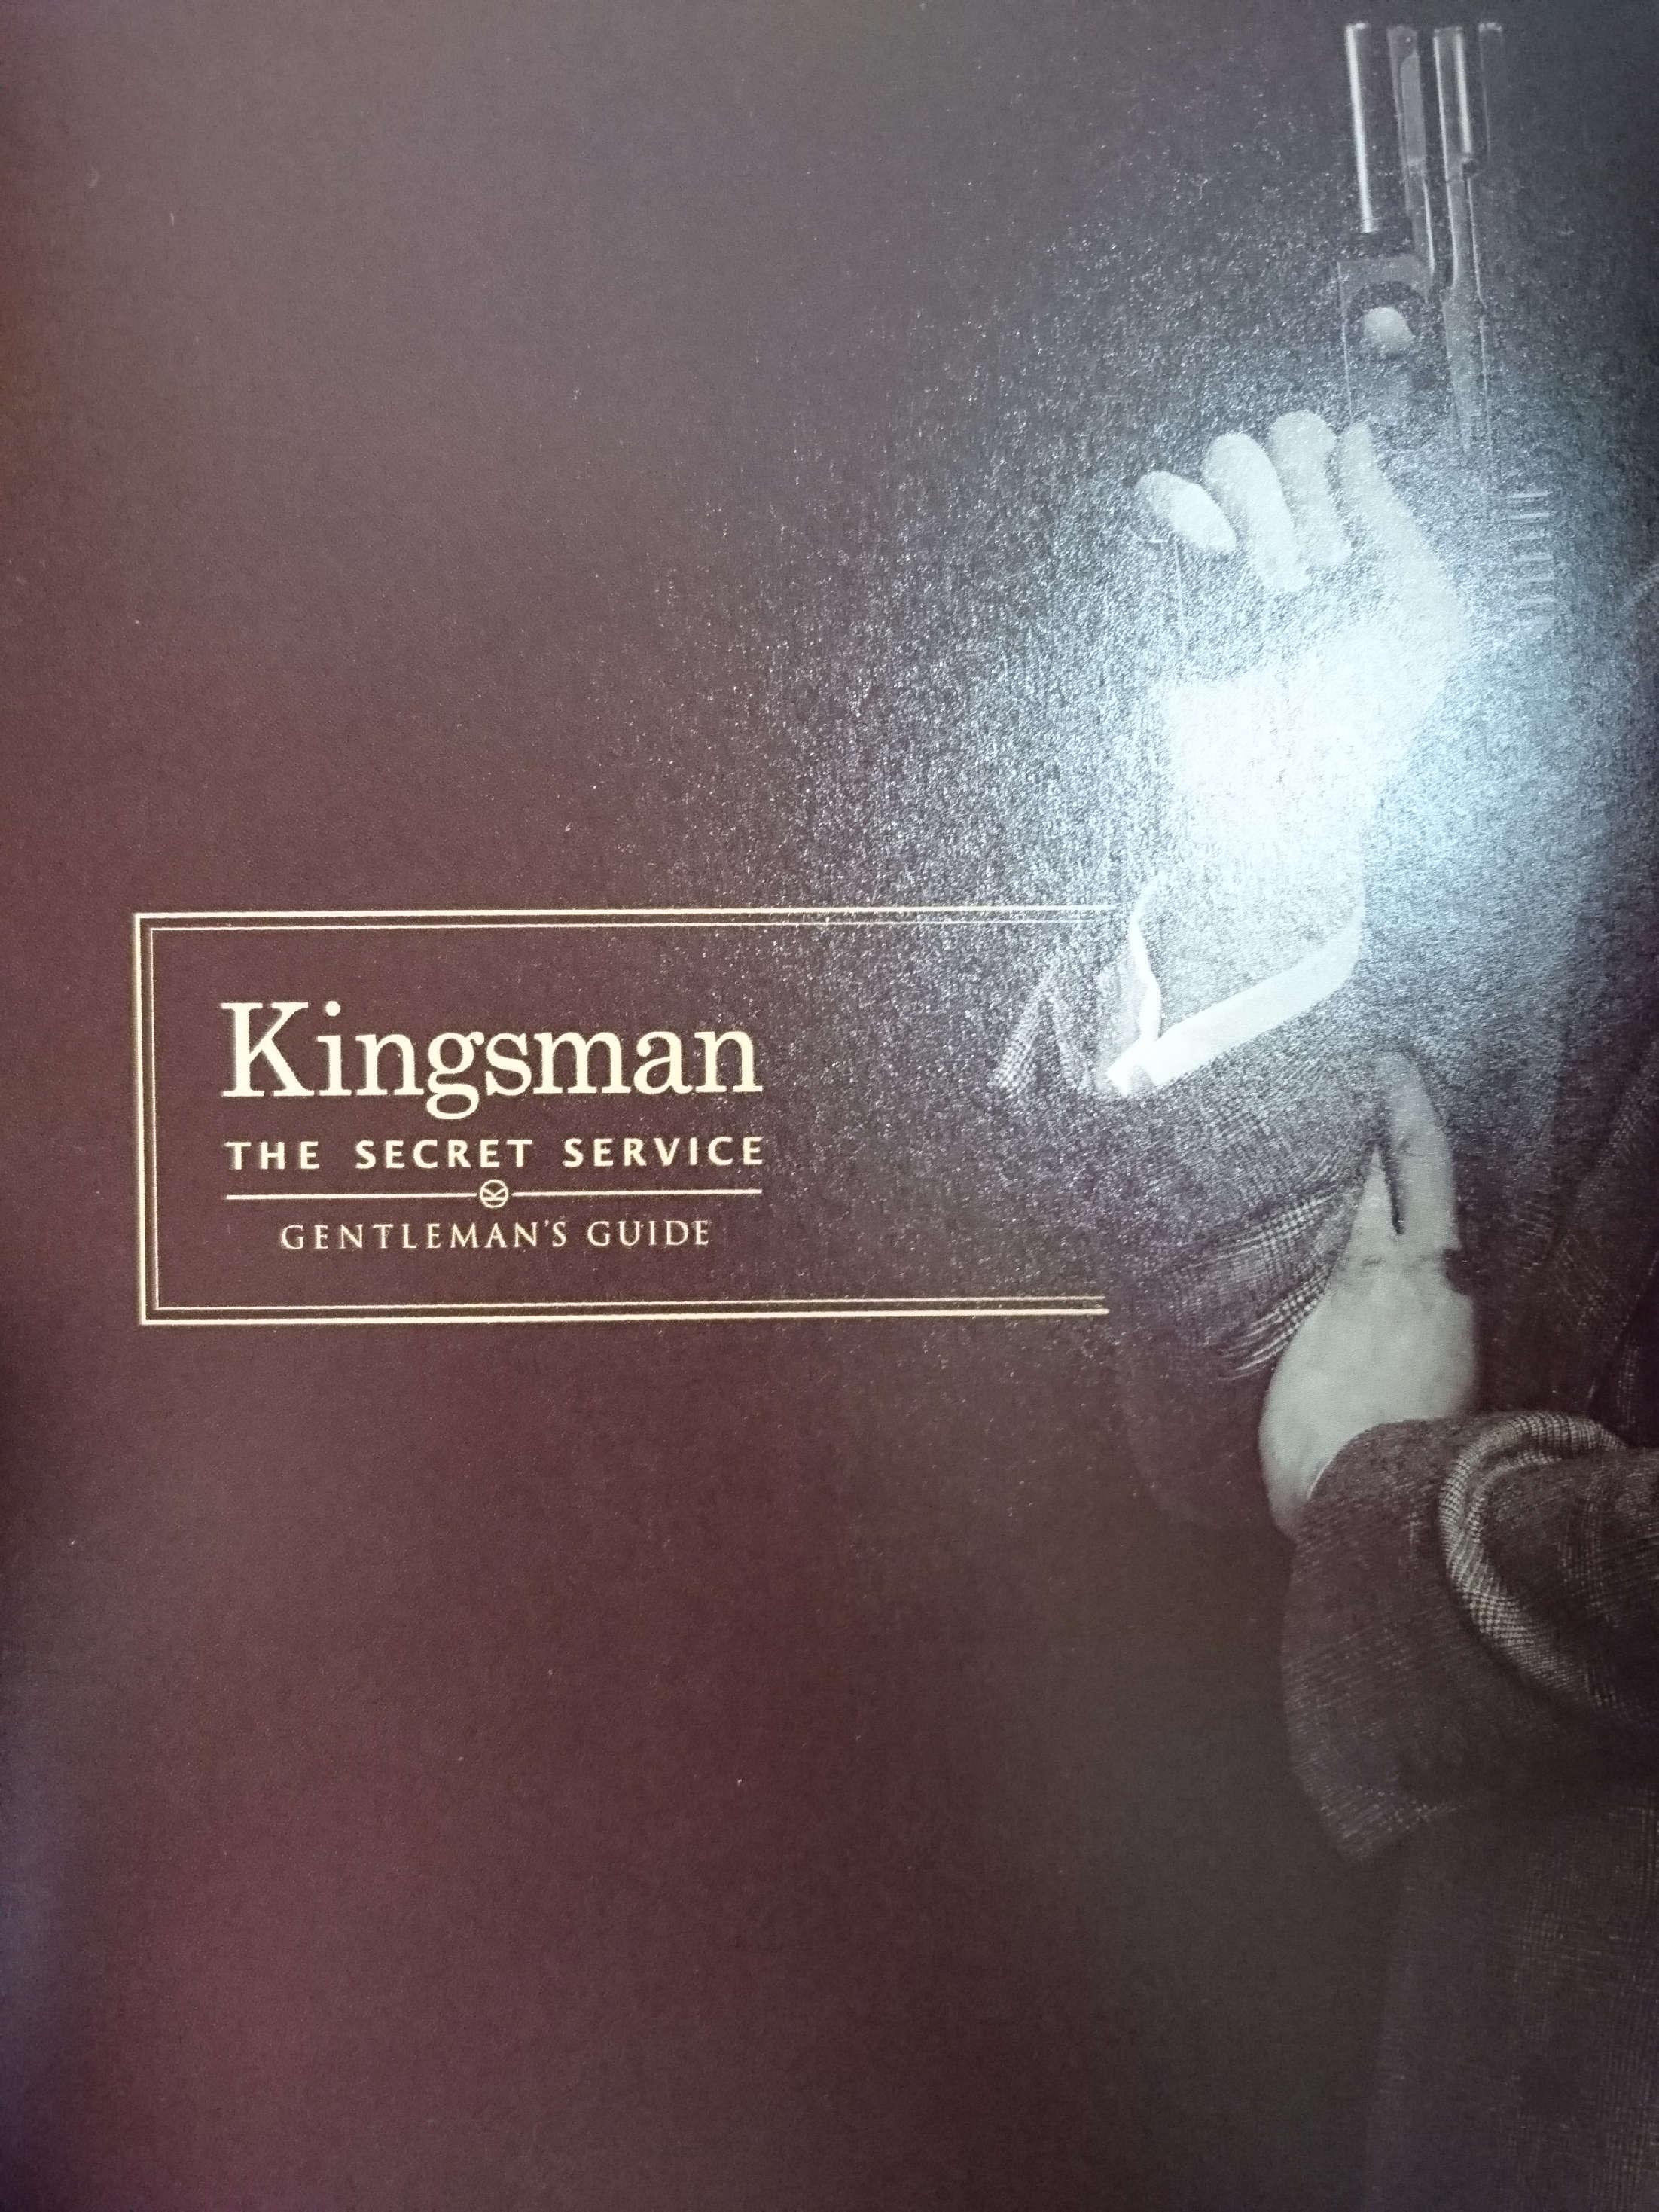 Kingsman7.jpg